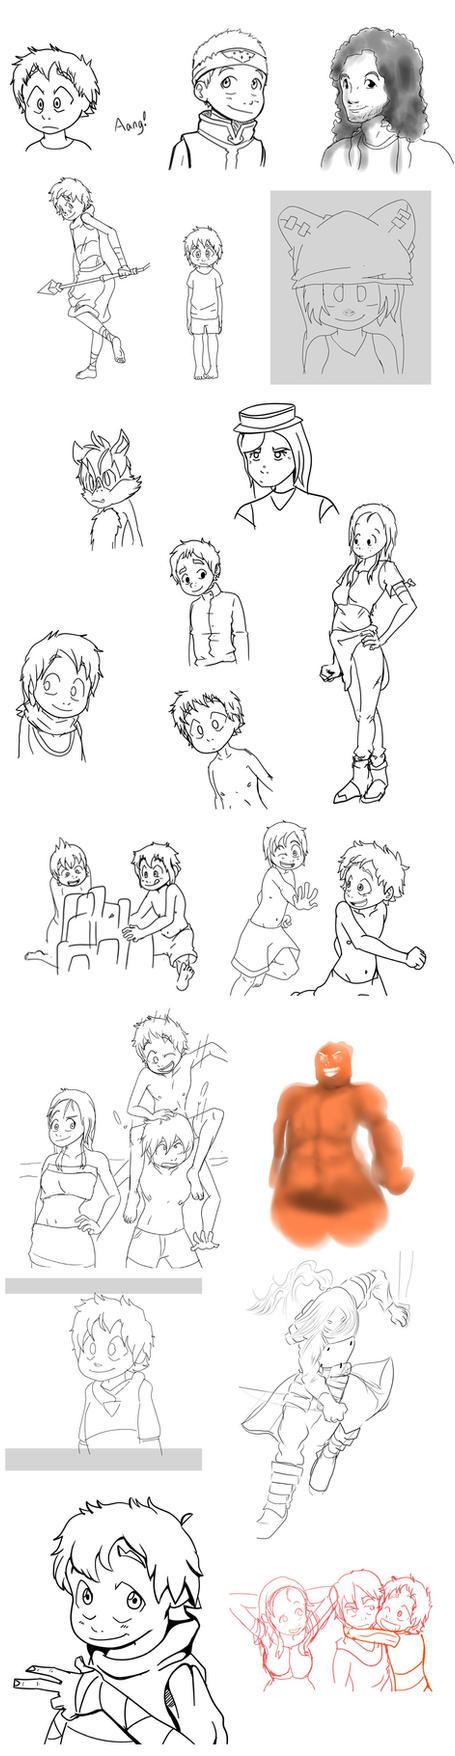 Sketch Dump 21! ULTRA Dump! by Parimak